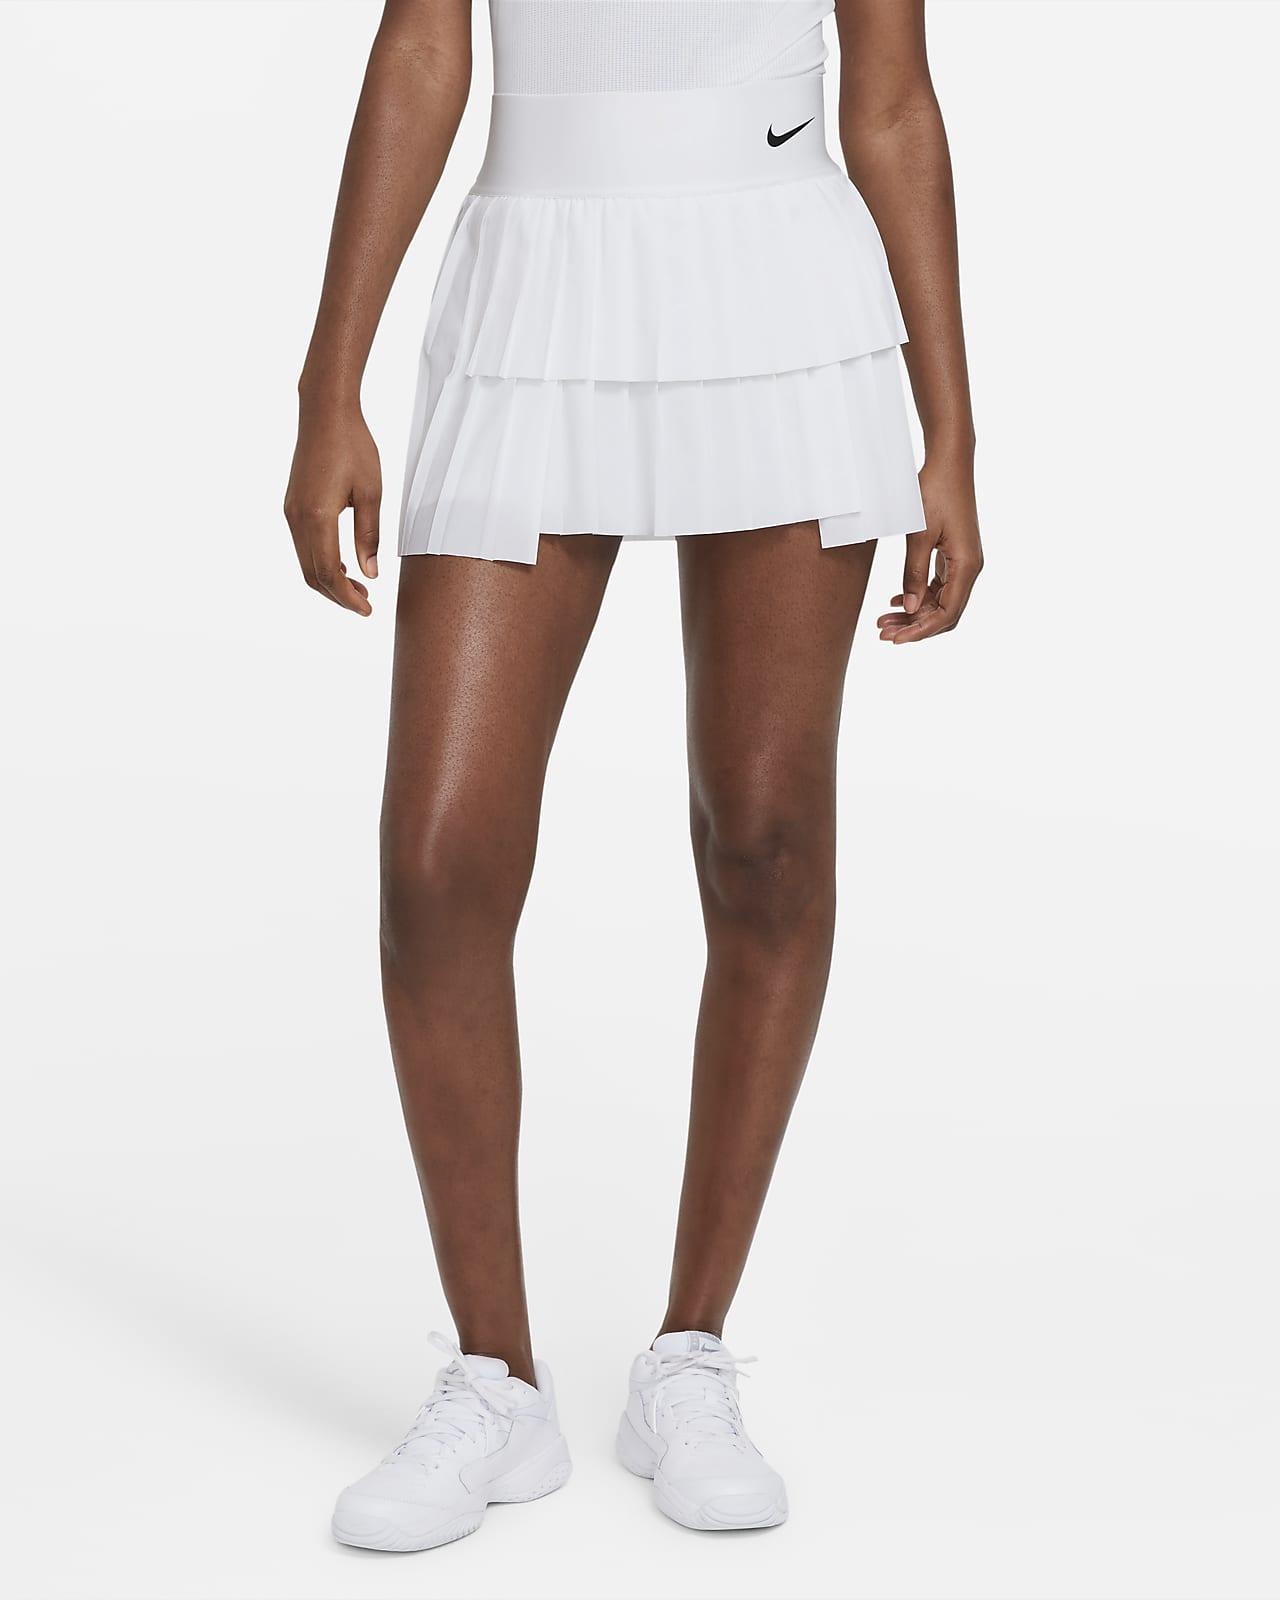 NikeCourt Advantage Women's Pleated Tennis Skirt